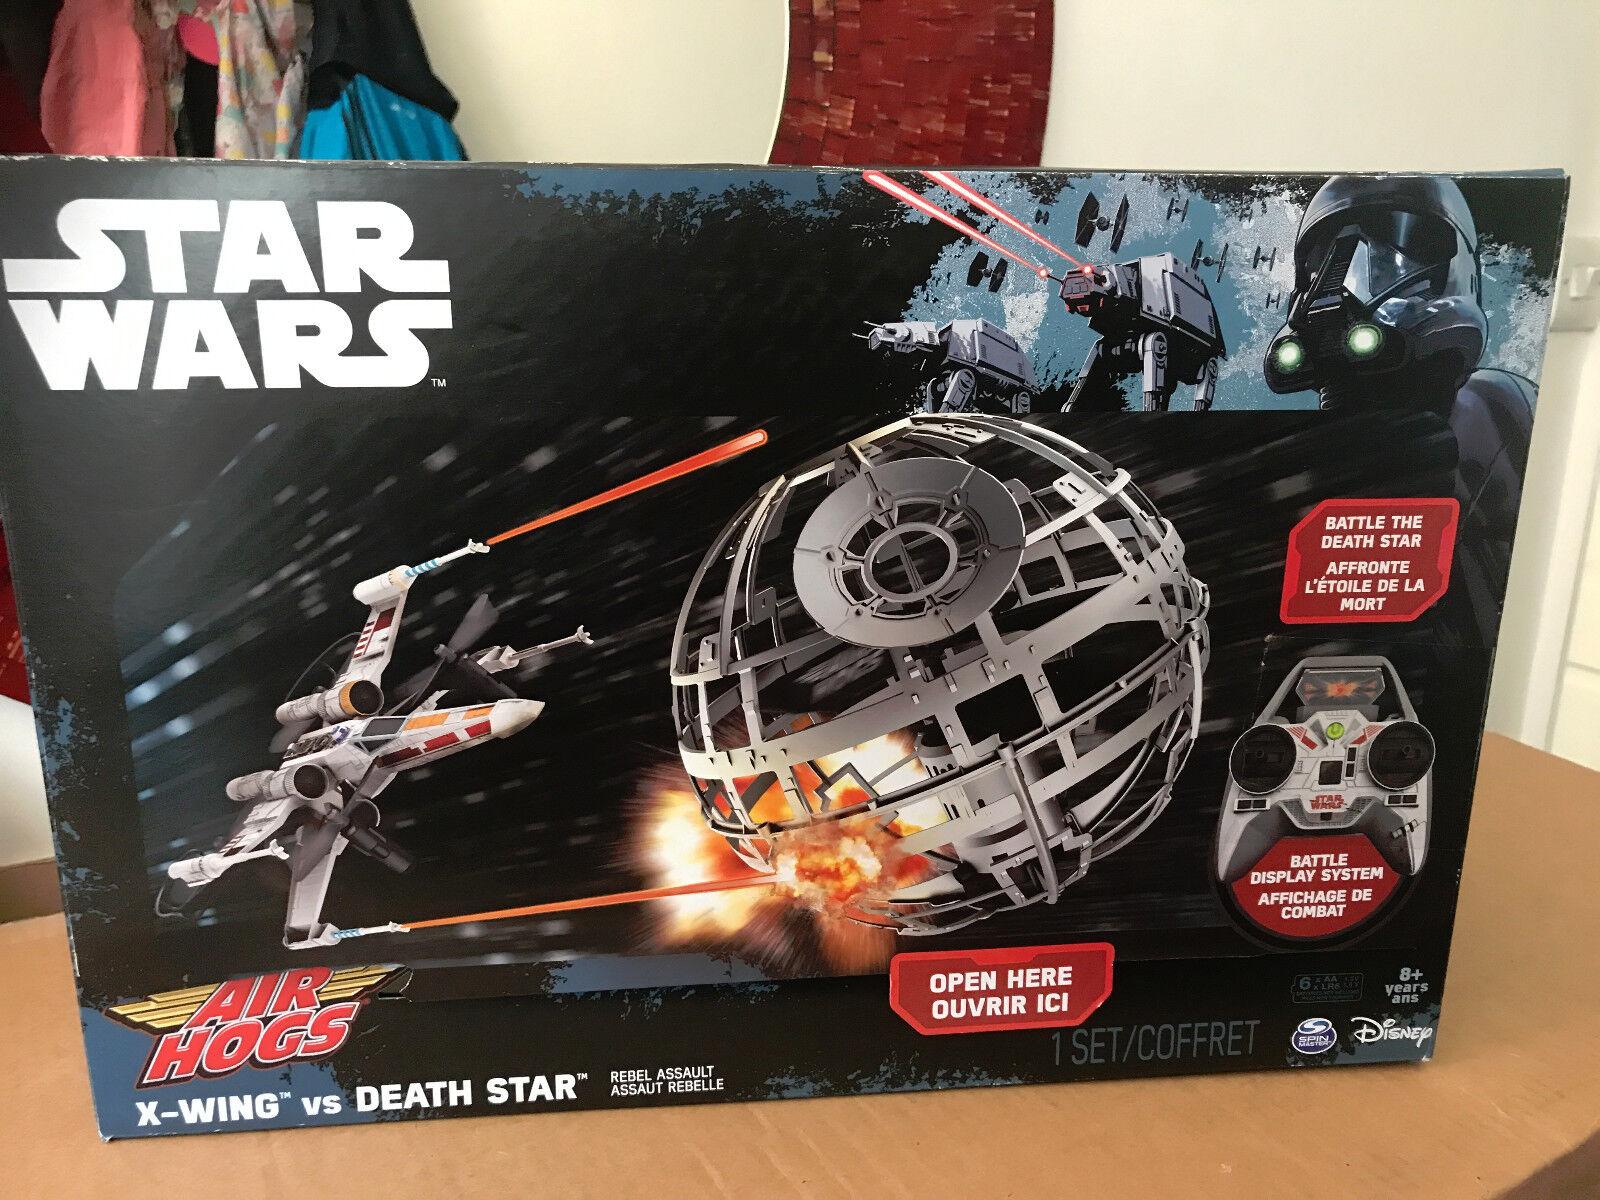 Air Hogs Star wars X-wing vs Death Star Rebel Assault